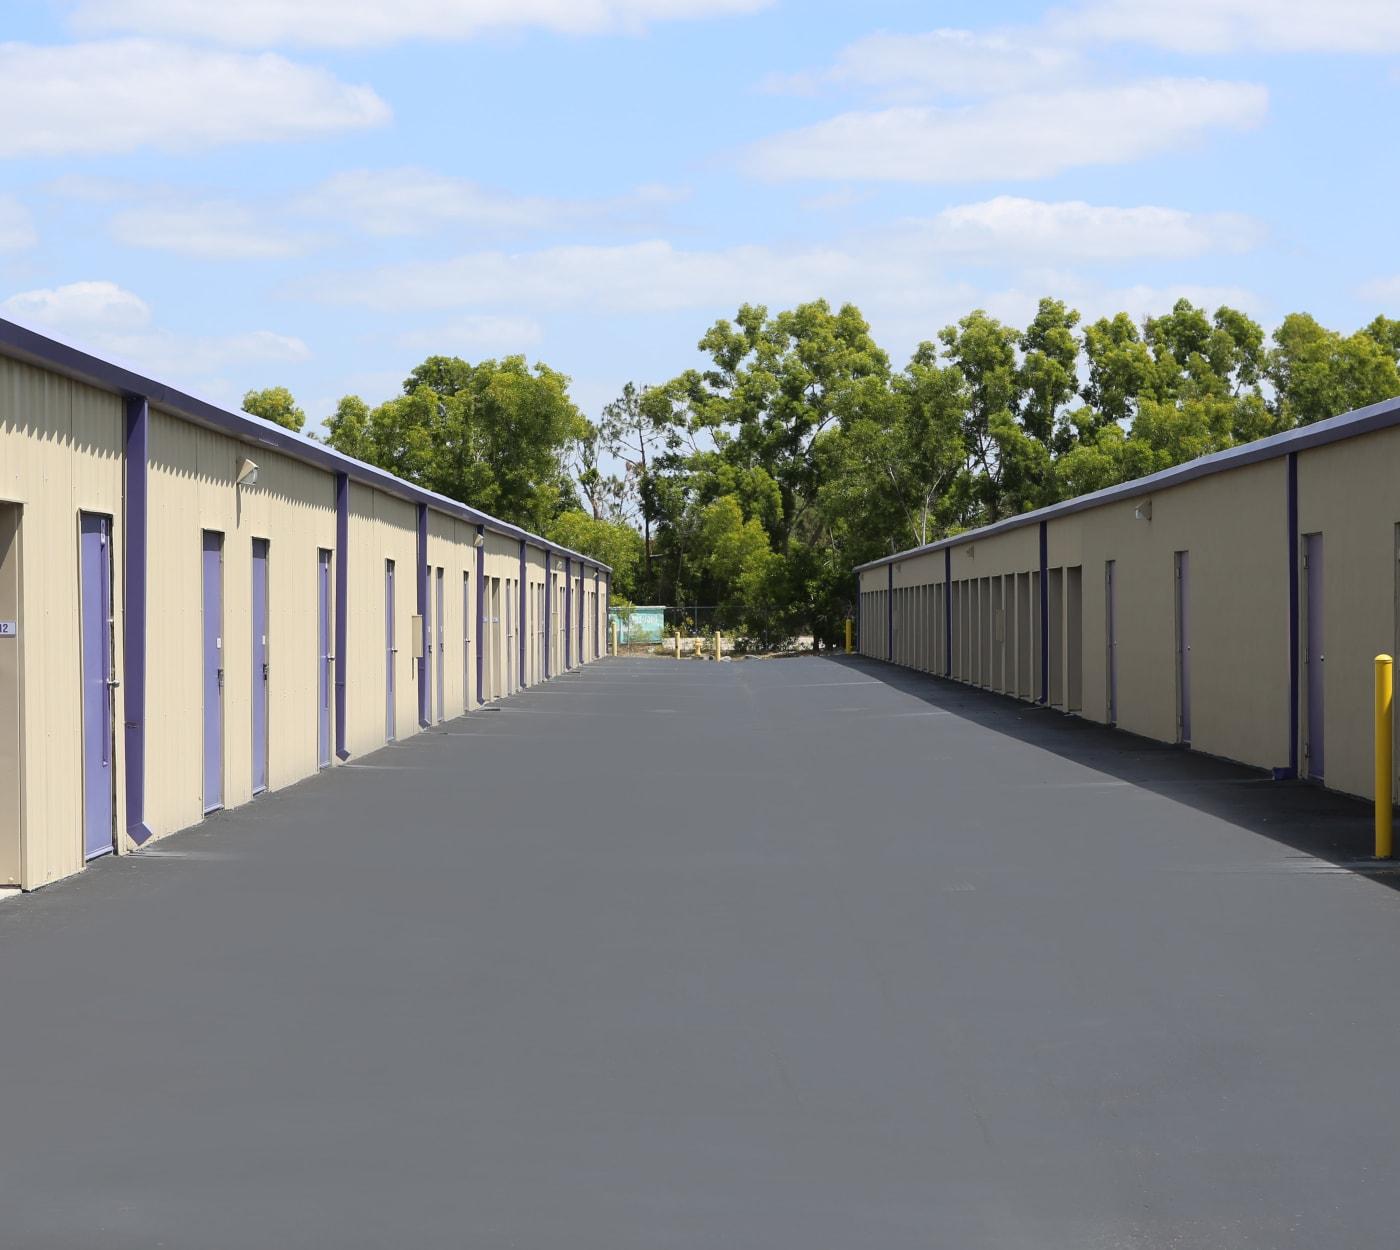 Large driveway at Midgard Self Storage in Jacksonville, Florida